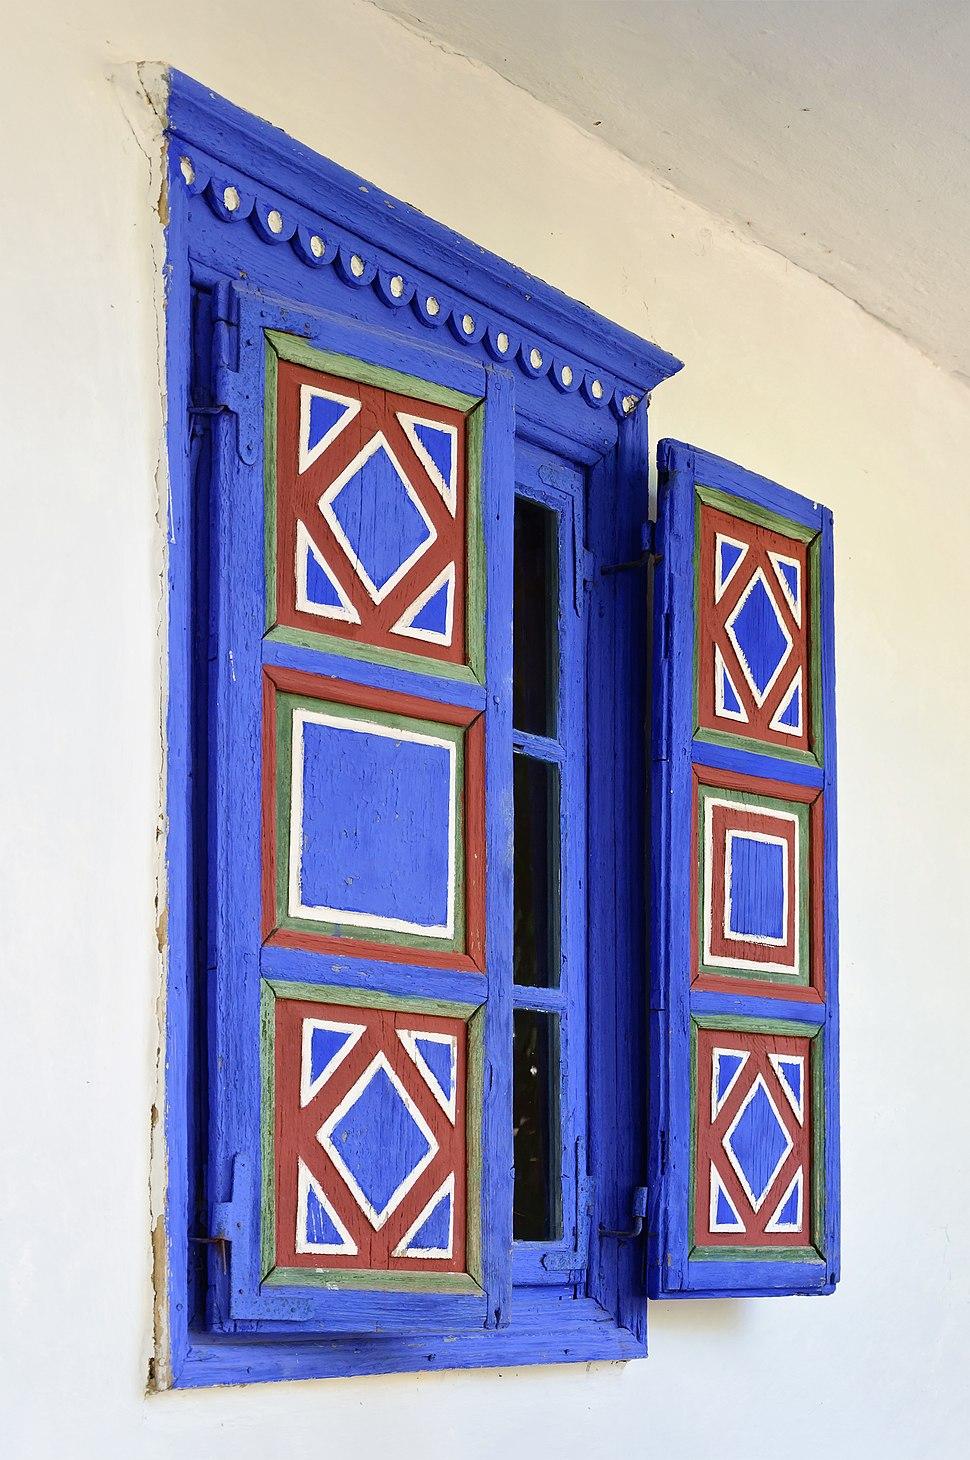 Fenetre bleue Jurilovca Musee Village Bucarest